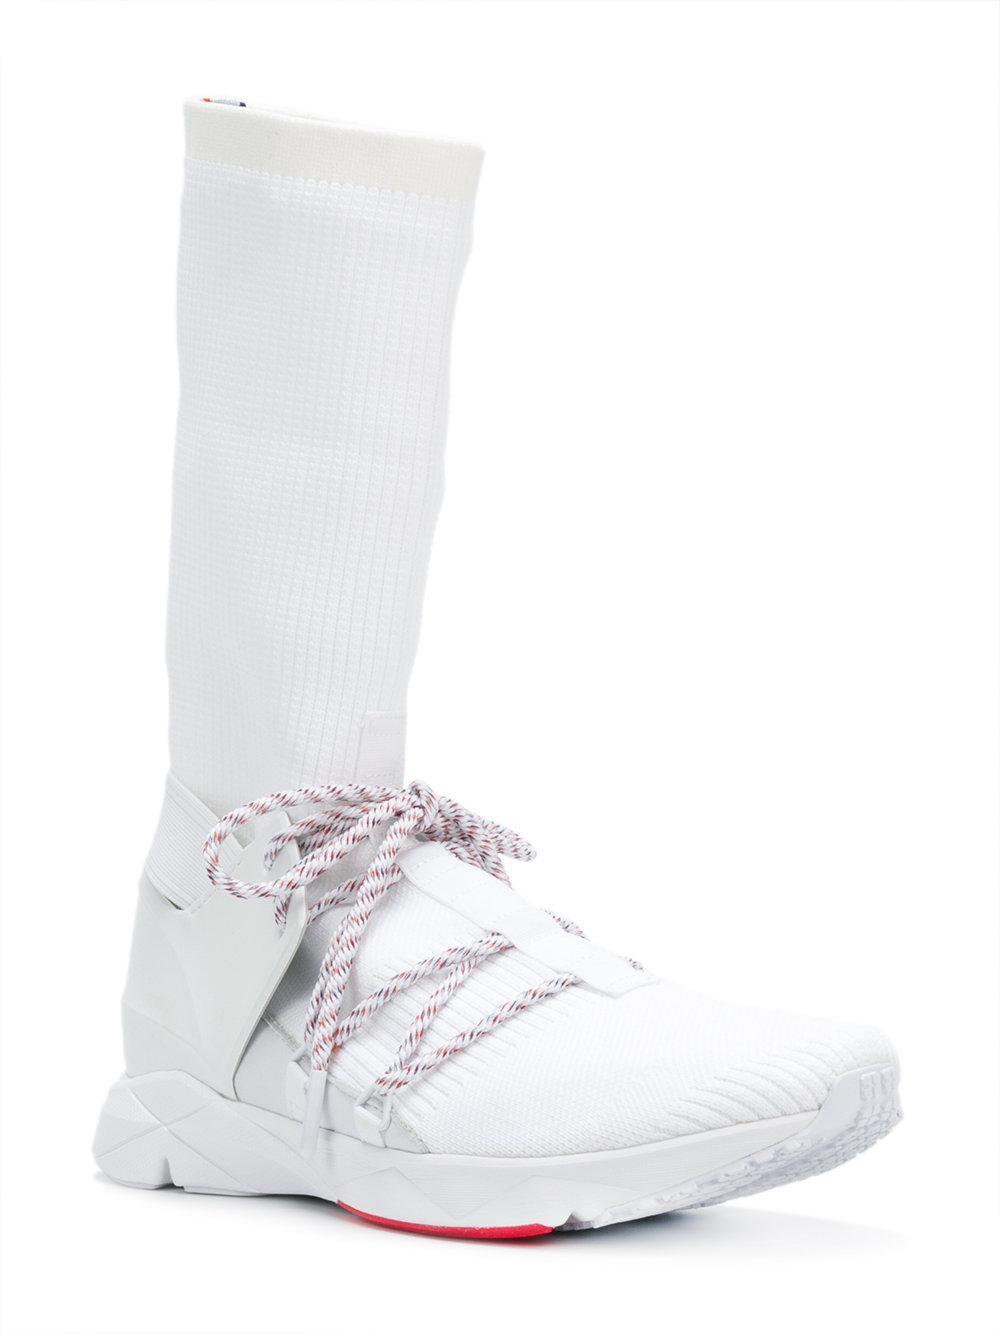 Reebok Cotton Knee-length Sock Sneakers in White